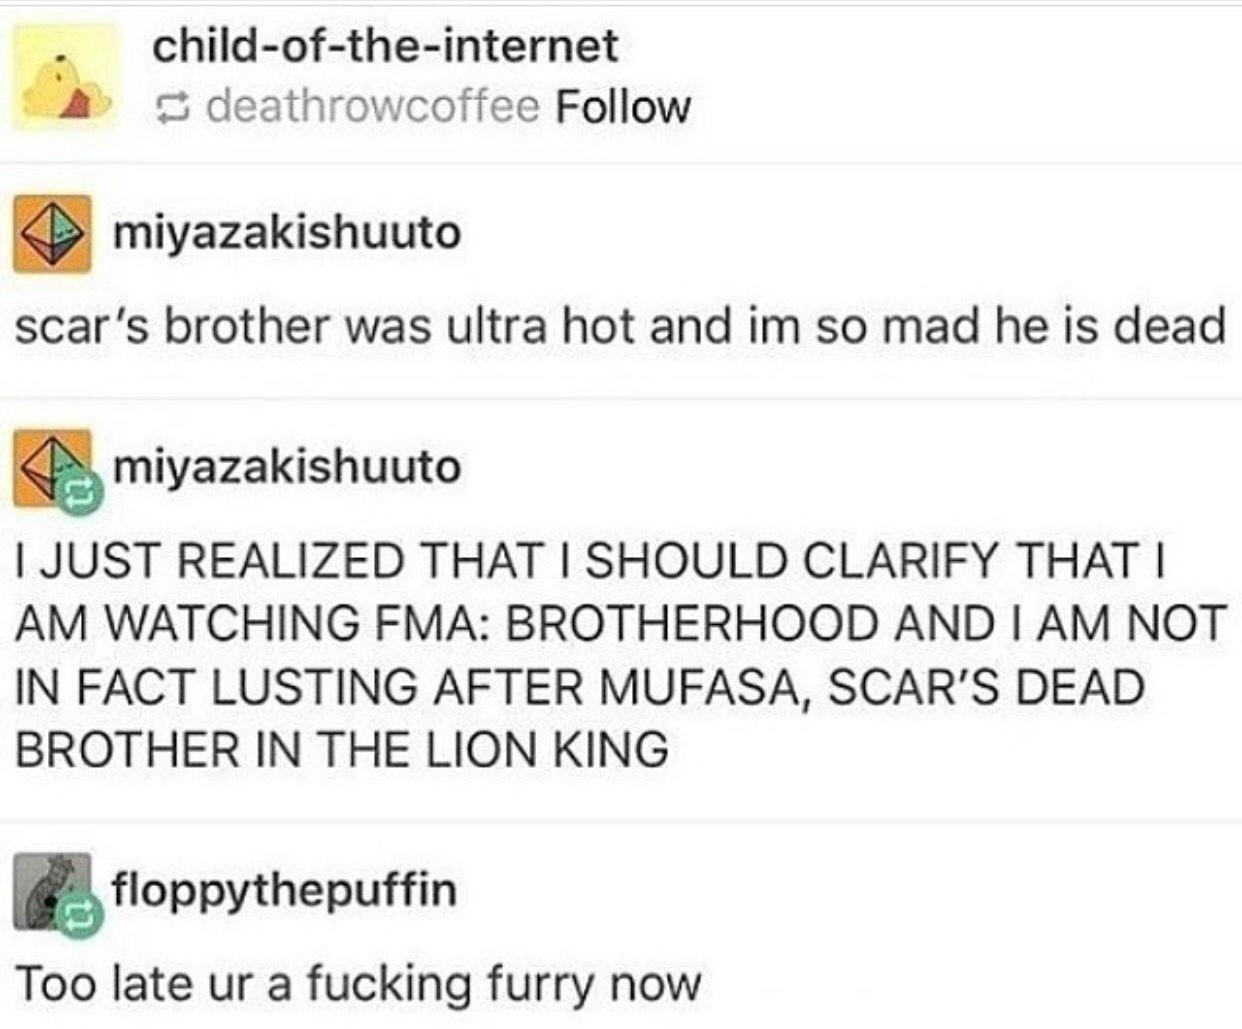 fuckin furry - meme